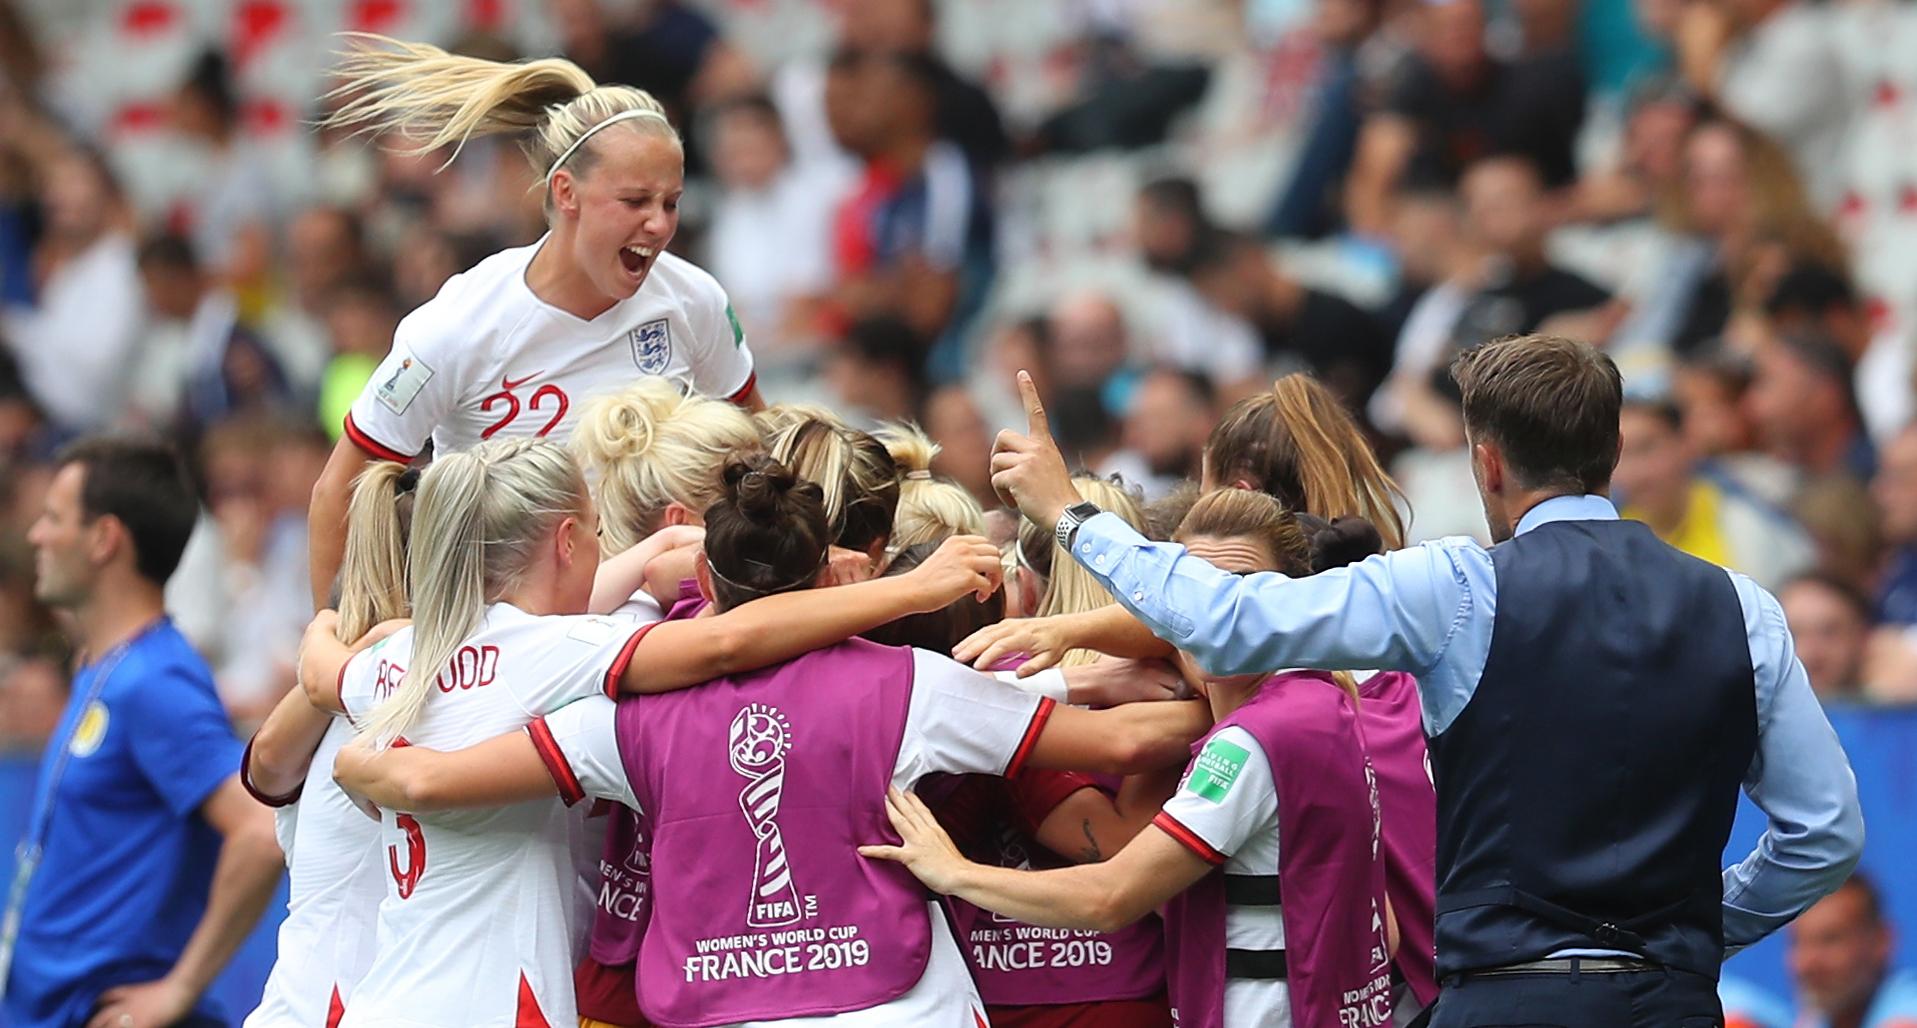 England Women v Scotland Women2019 FIFA Women's World Cup